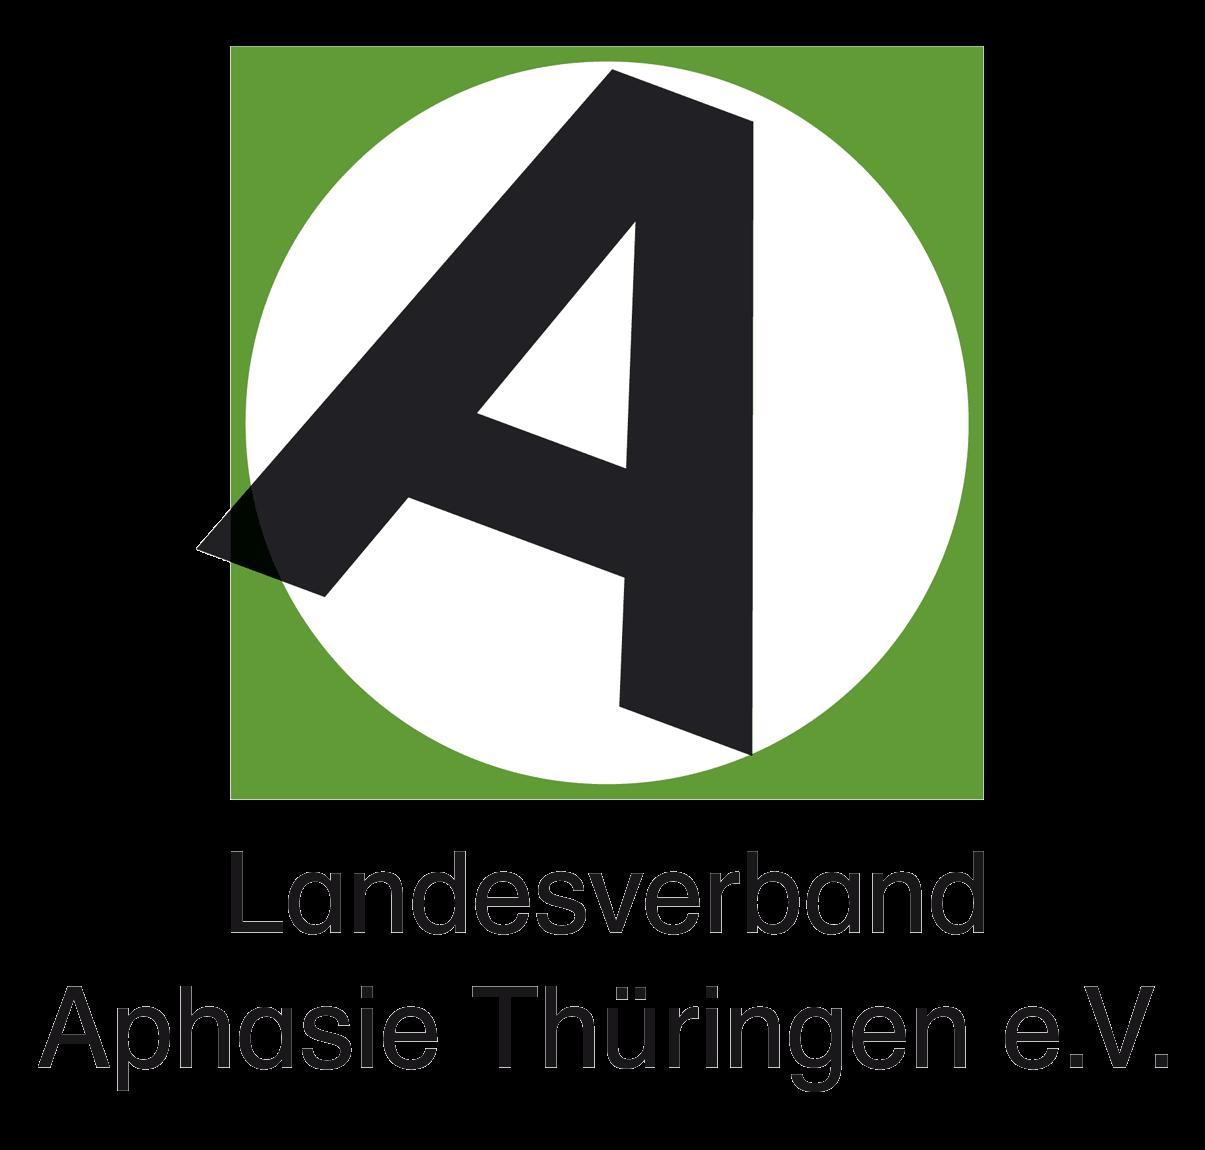 Logo Landesverband Aphasie Thüringen e.V.